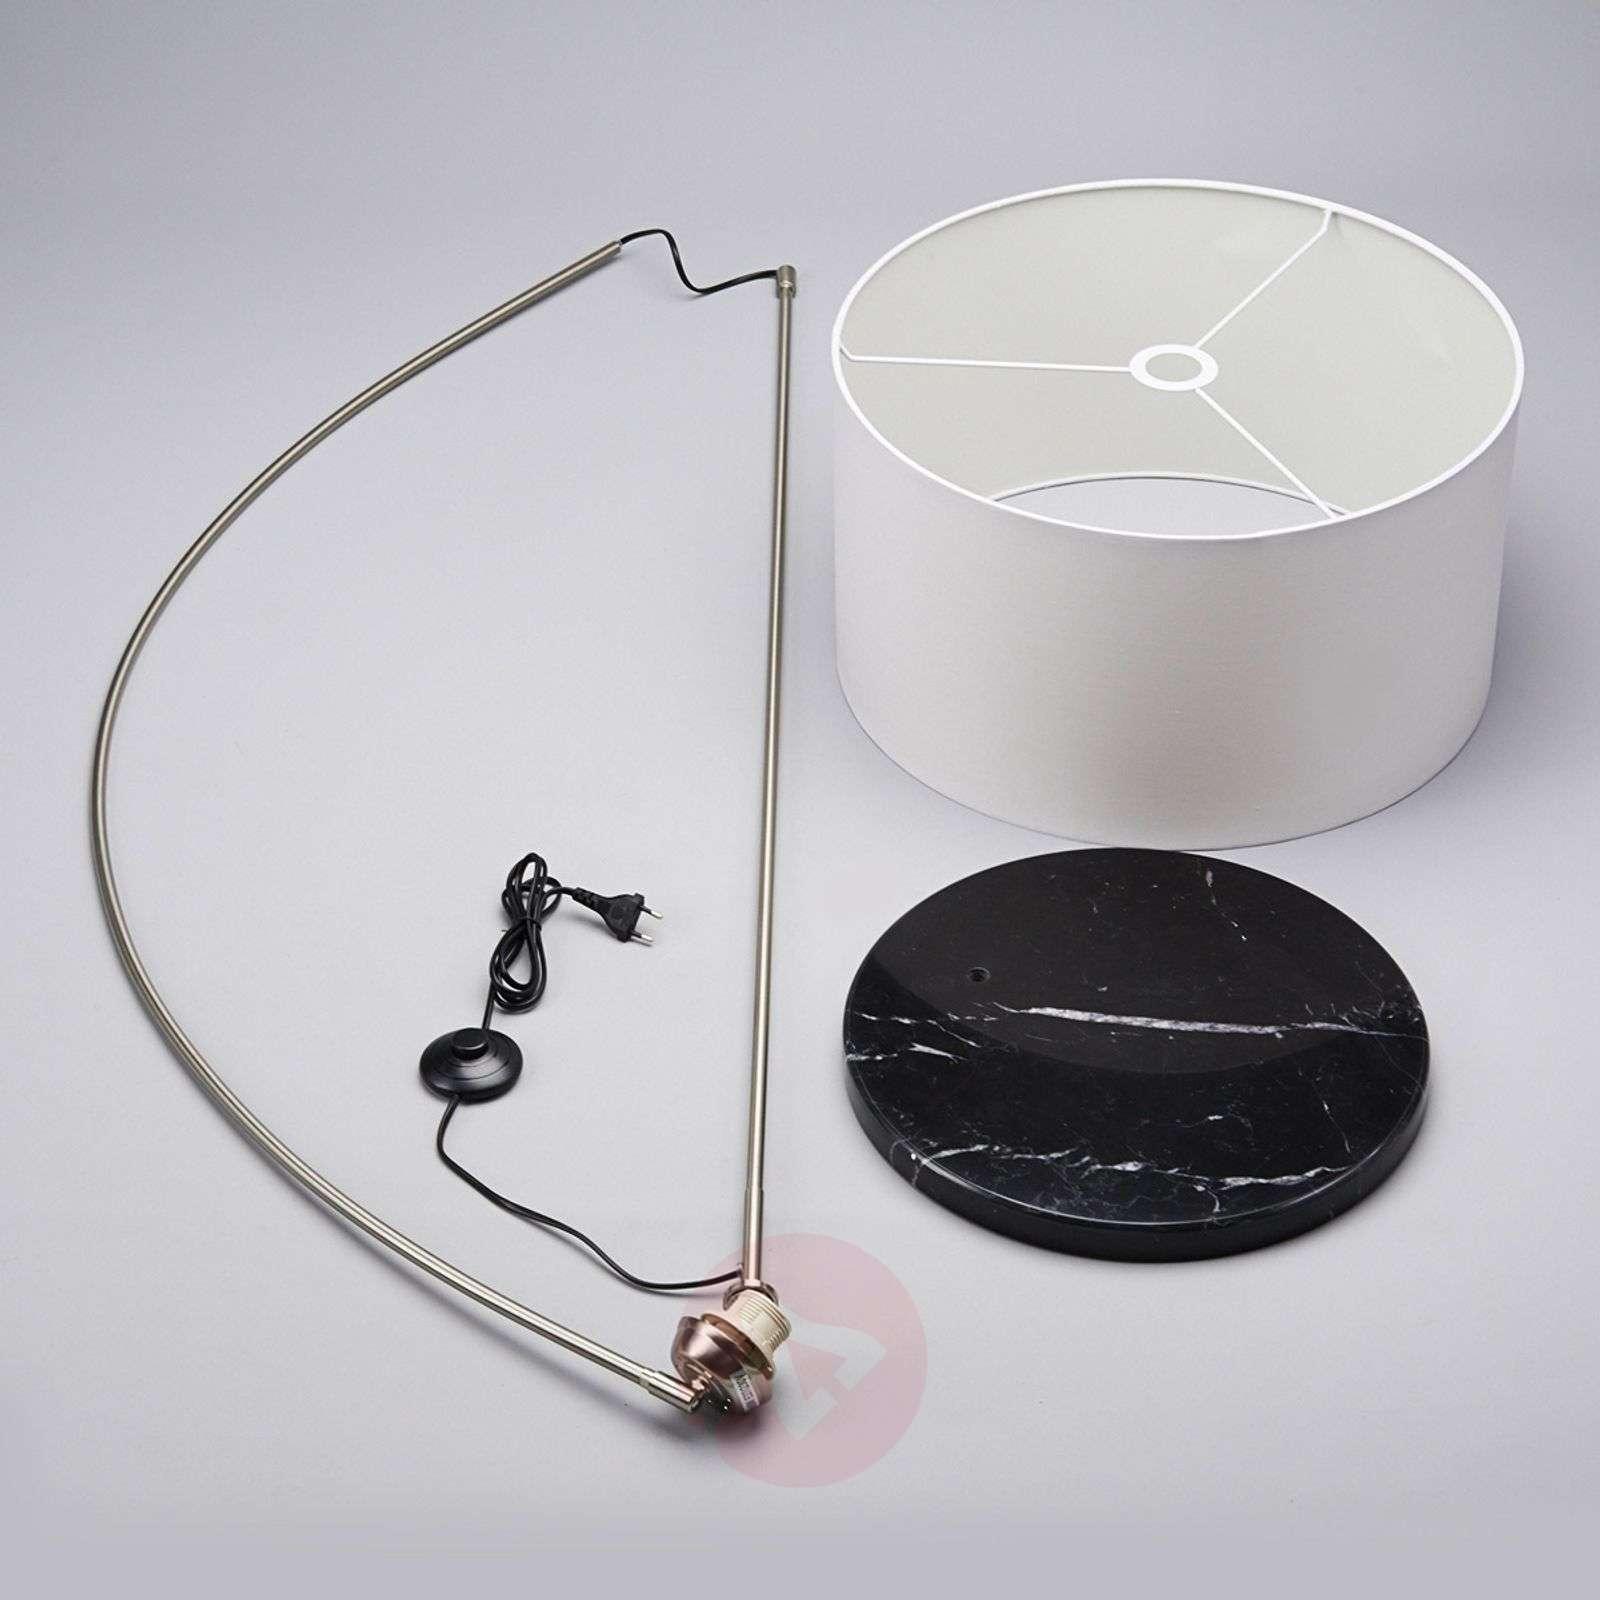 Alia fabric floor lamp with an LED lamp-9620175-01